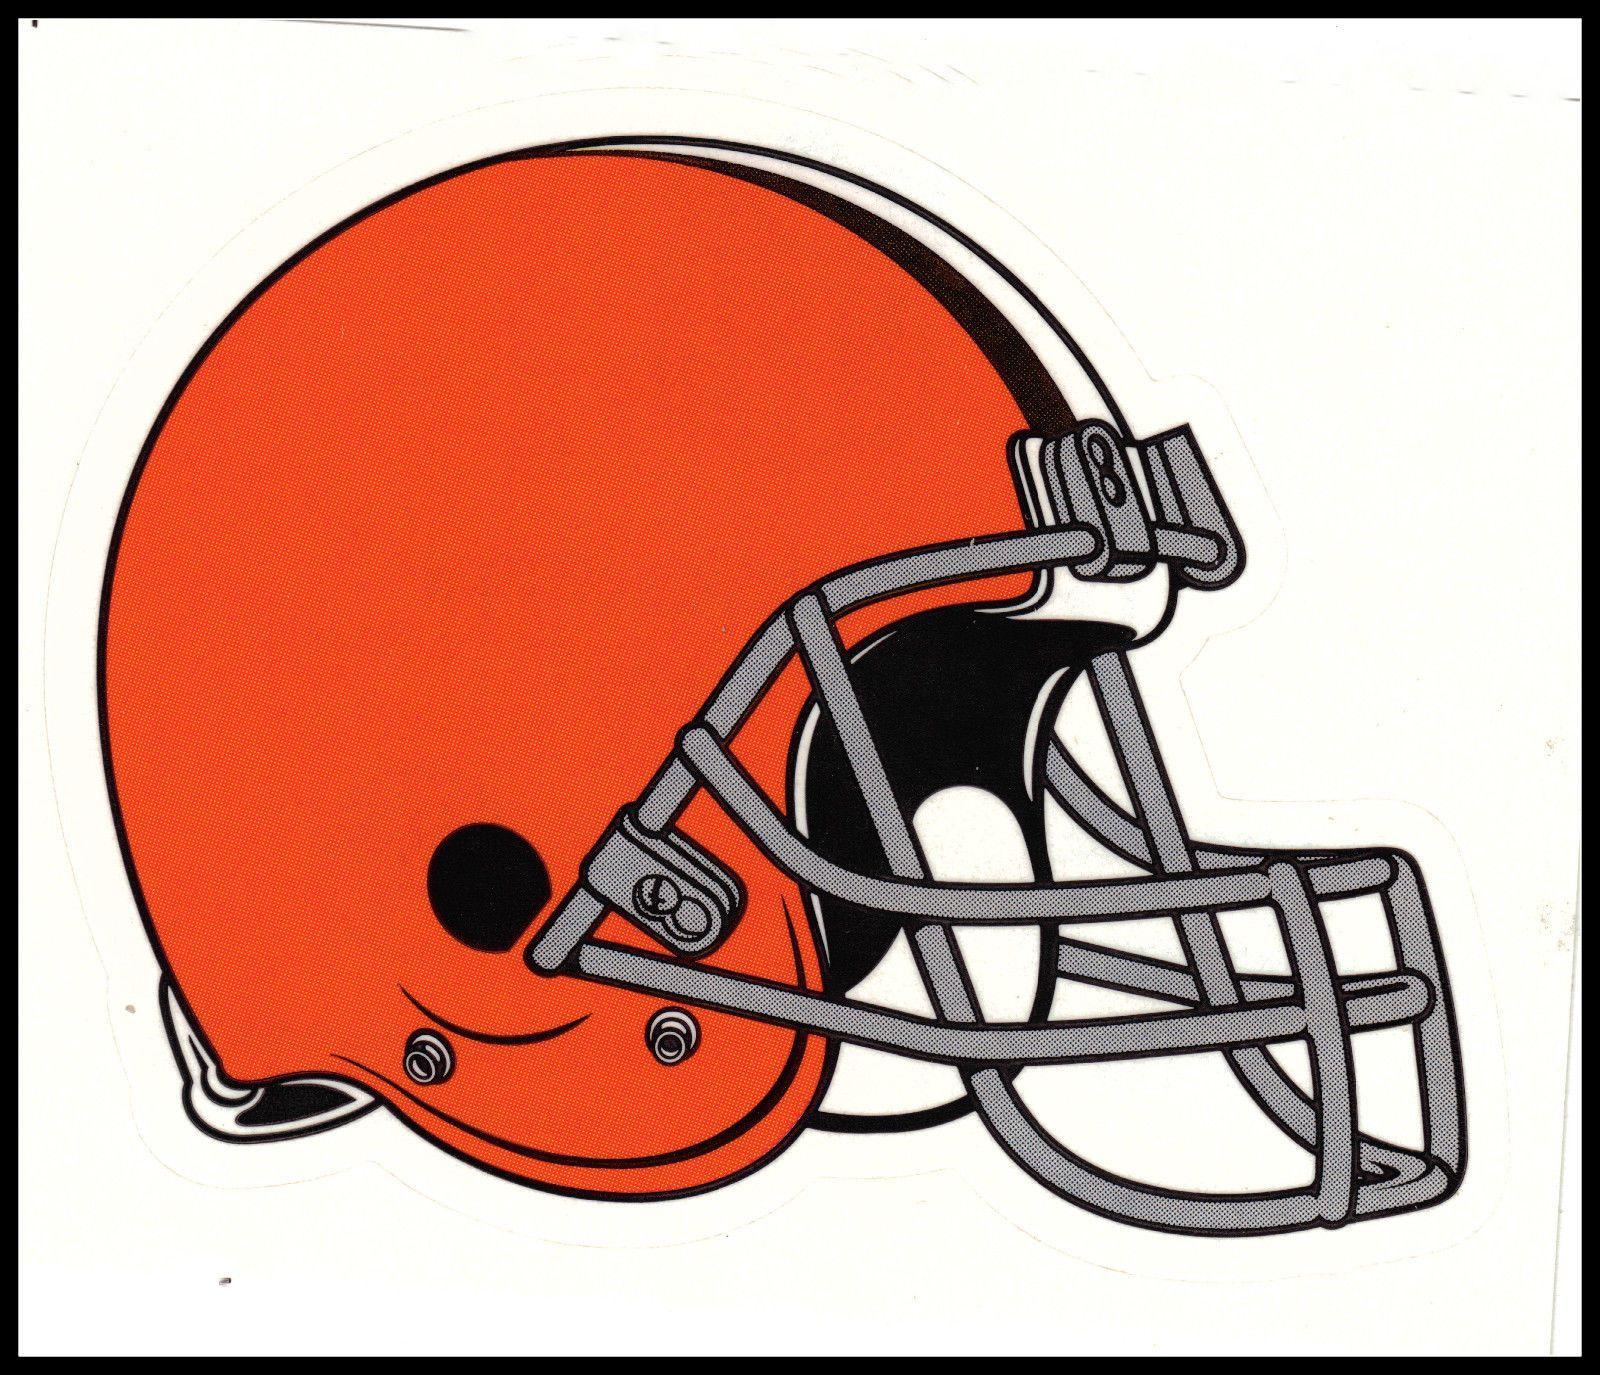 Details about CLEVELAND BROWNS FOOTBALL NFL TEAM LOGO